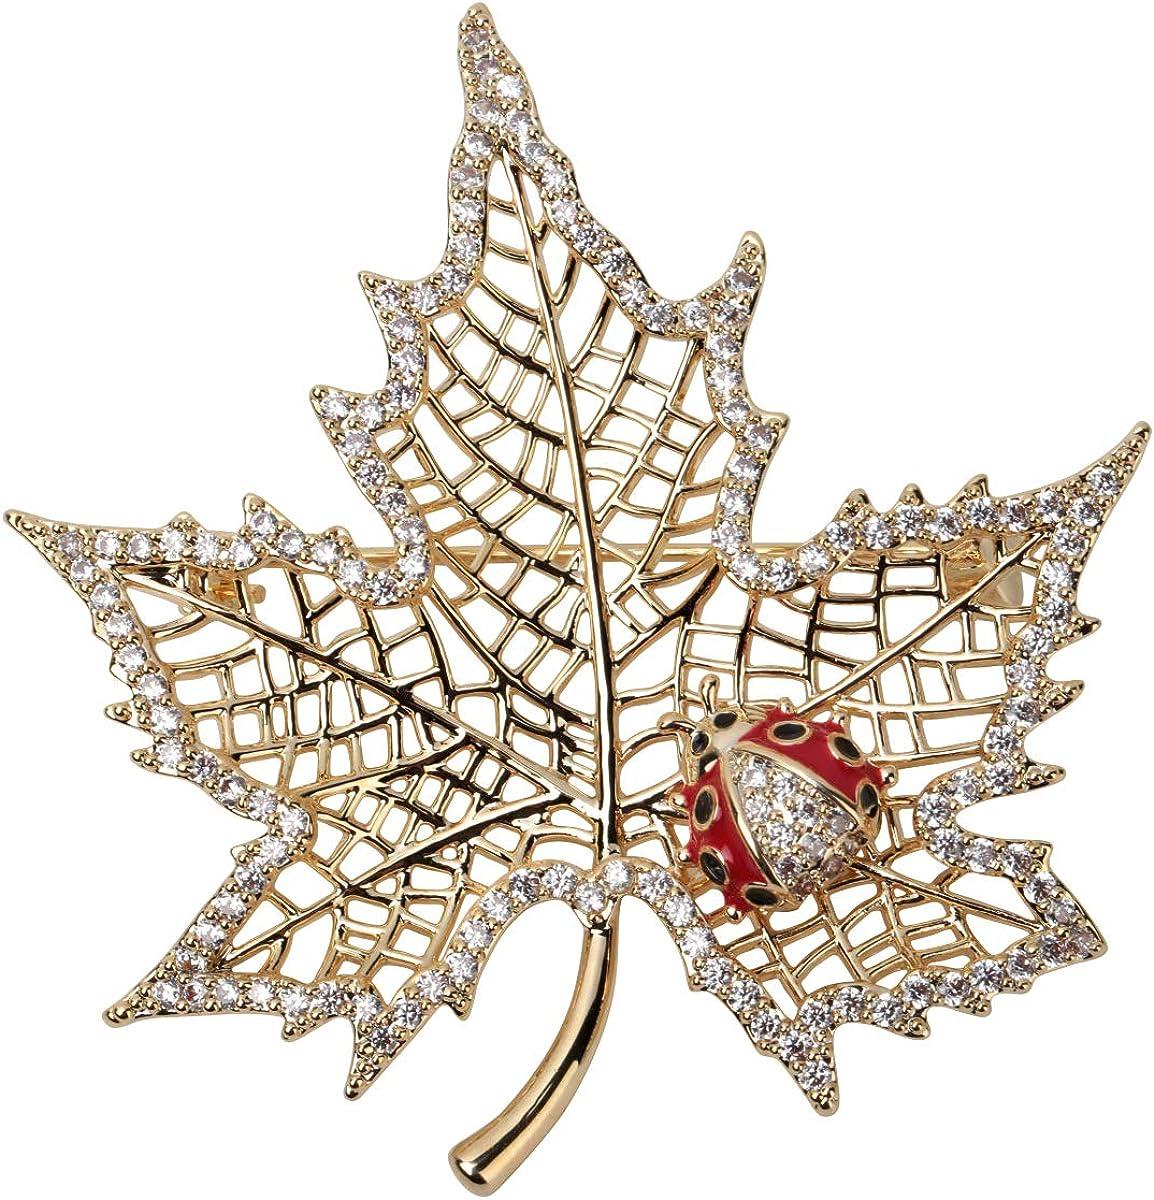 YACQ Women's Ladybug on Maple Leaf Pin Brooch - CZ & Enamel Fall Jewelry - Ultra Light - 2 x 1-3/4 Inches - Scarf Holders - Perfect for Blouse Jacket Coat Handbag